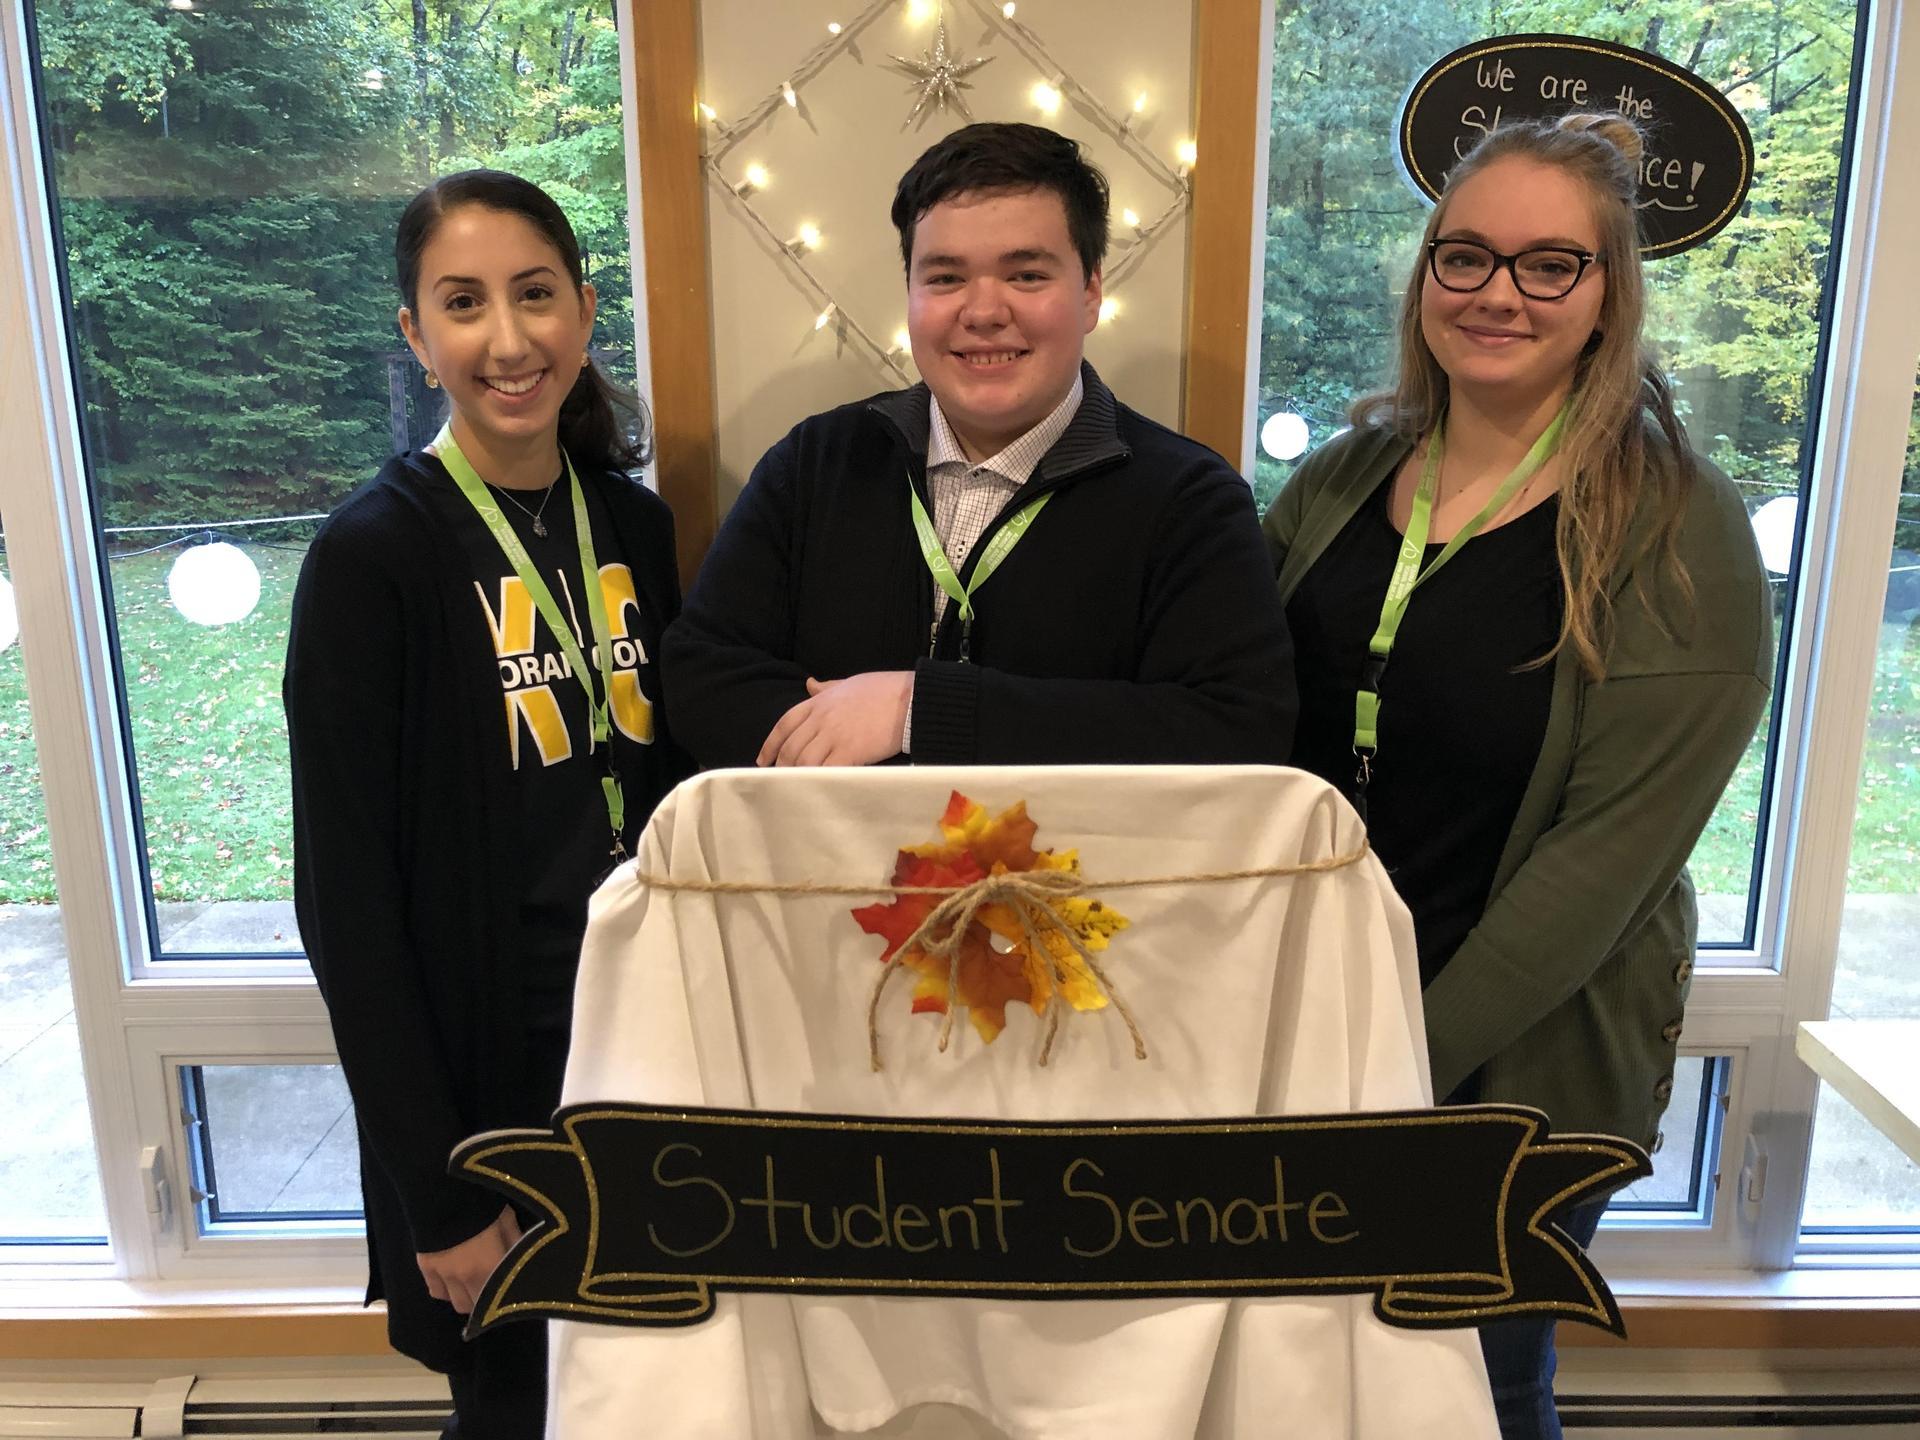 3 student trustees